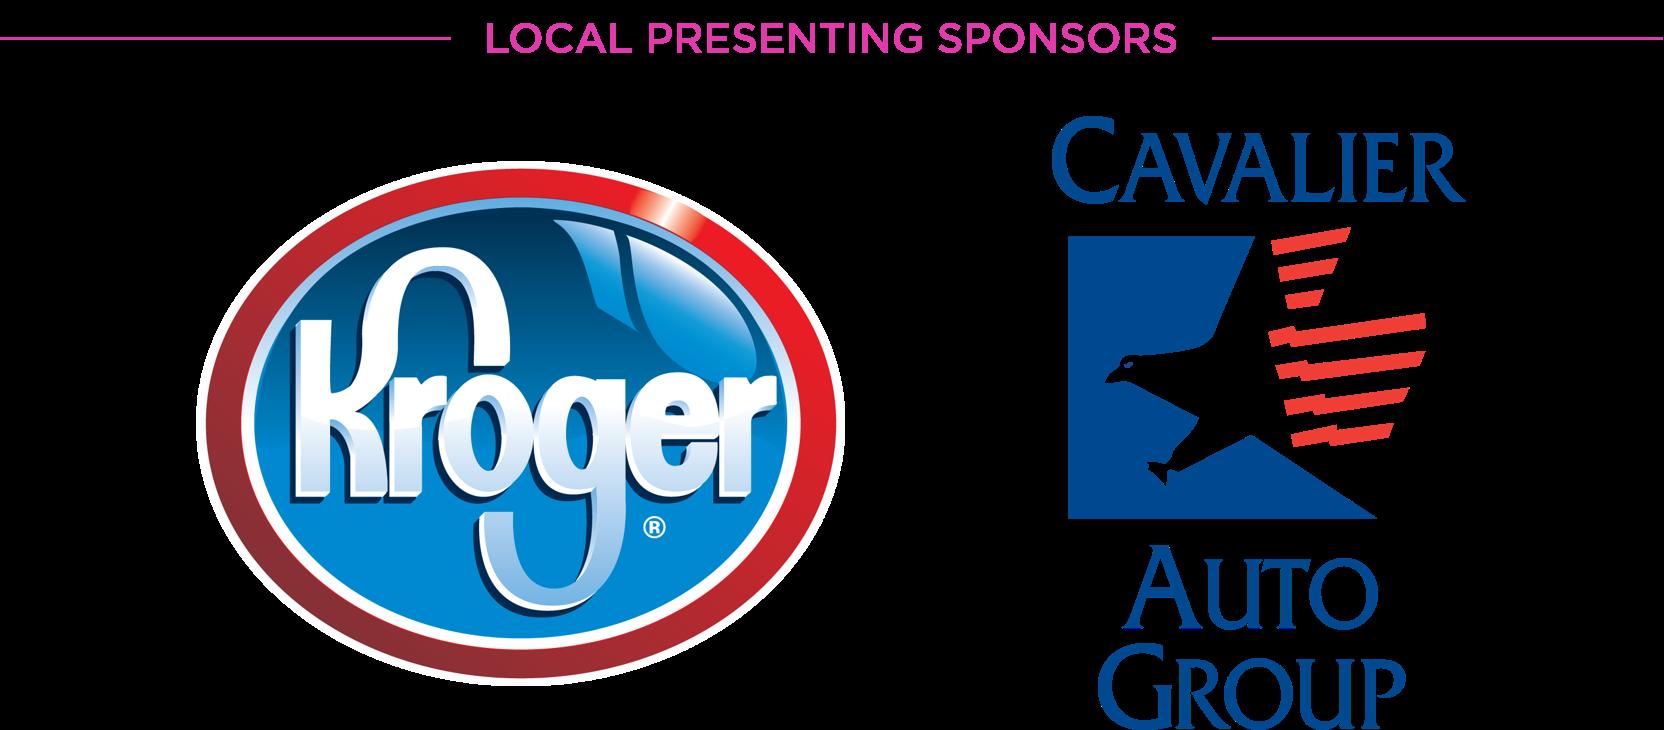 2019 VAB Walk - local presenting sponsor lockup - 2019 0806